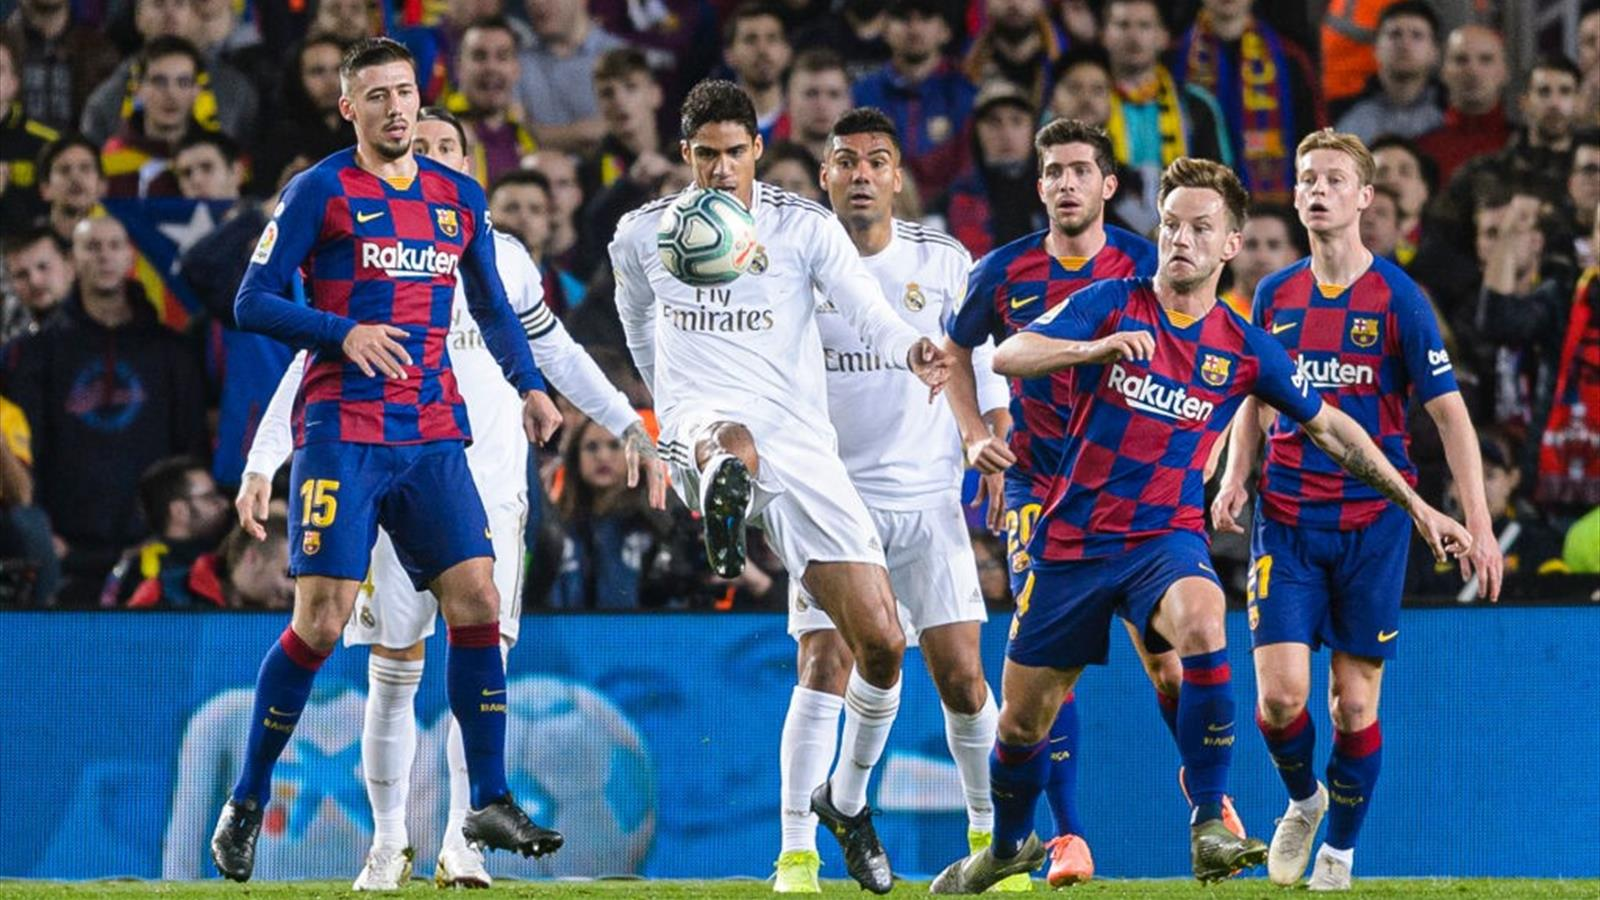 Барселона реал мадрид кубок испании запись